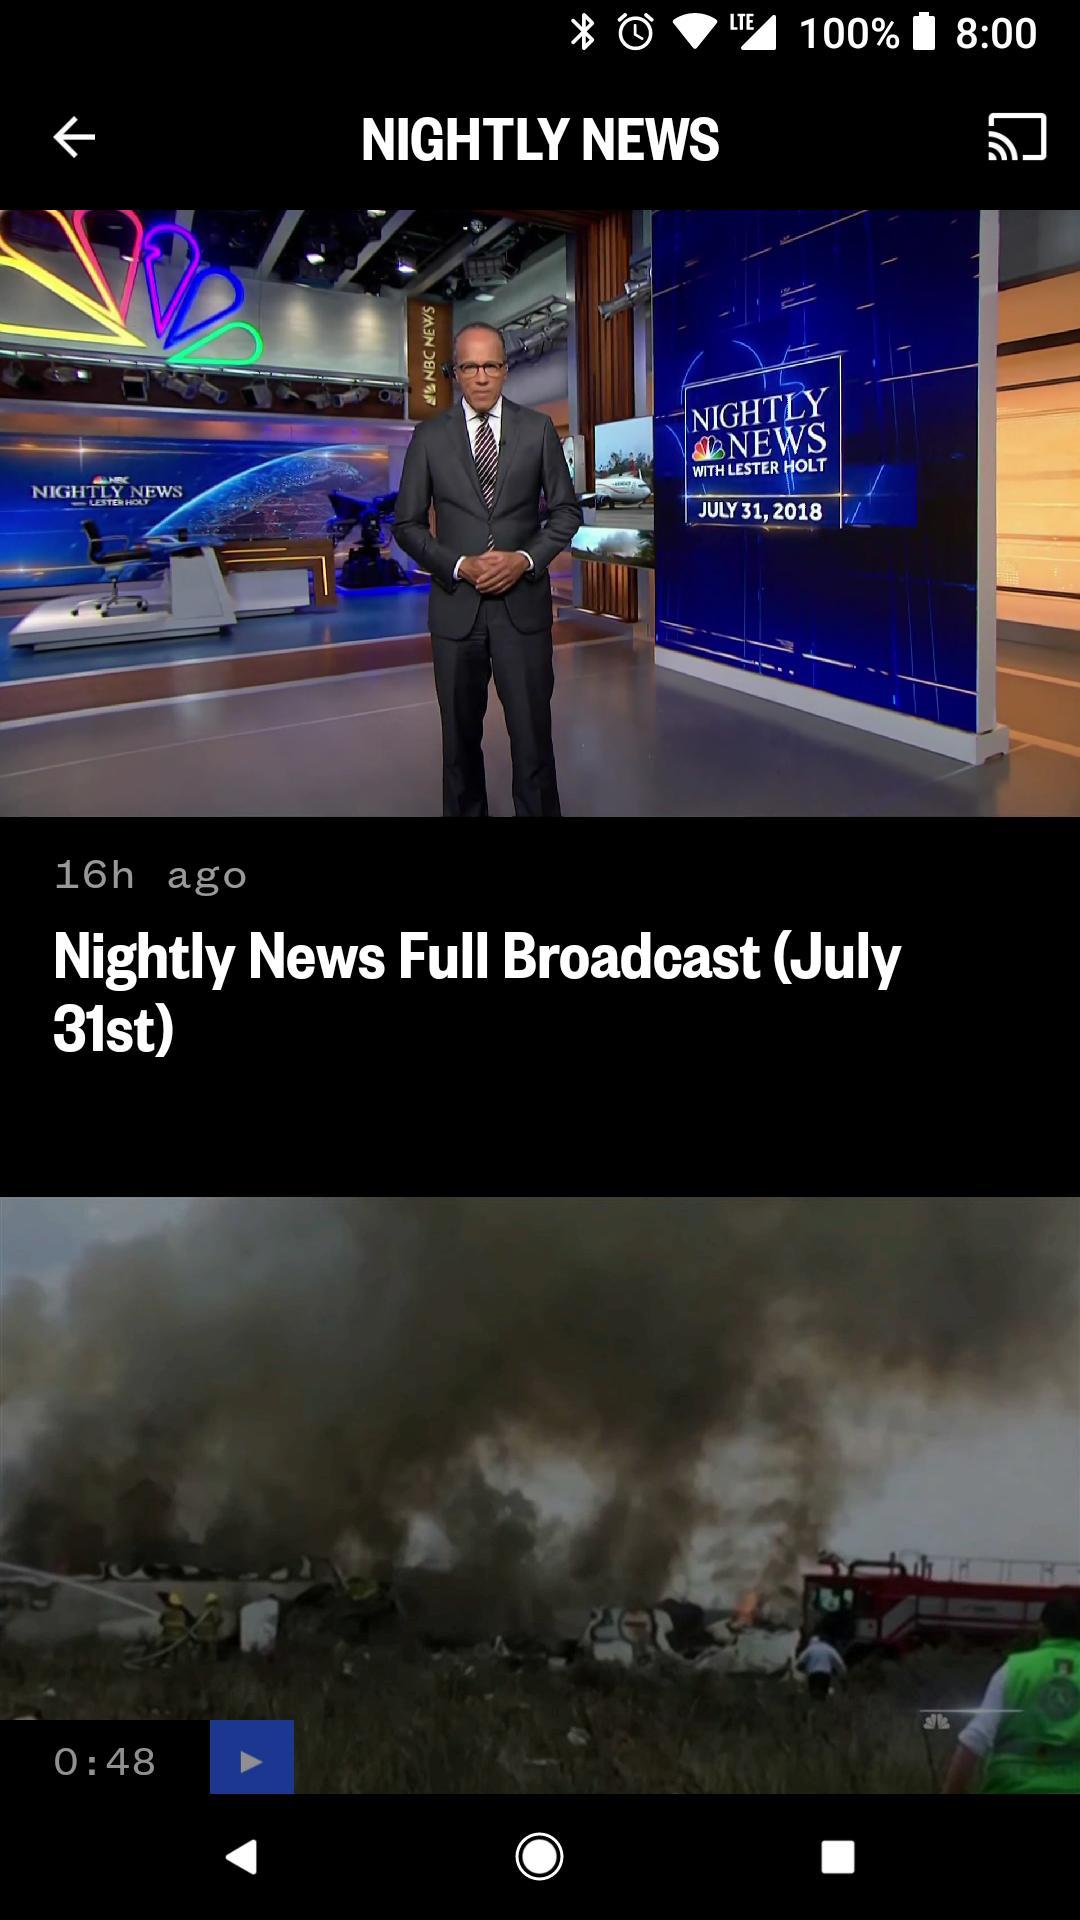 NBC News: Breaking News, US News & Live Video 6.0.11 Screenshot 5